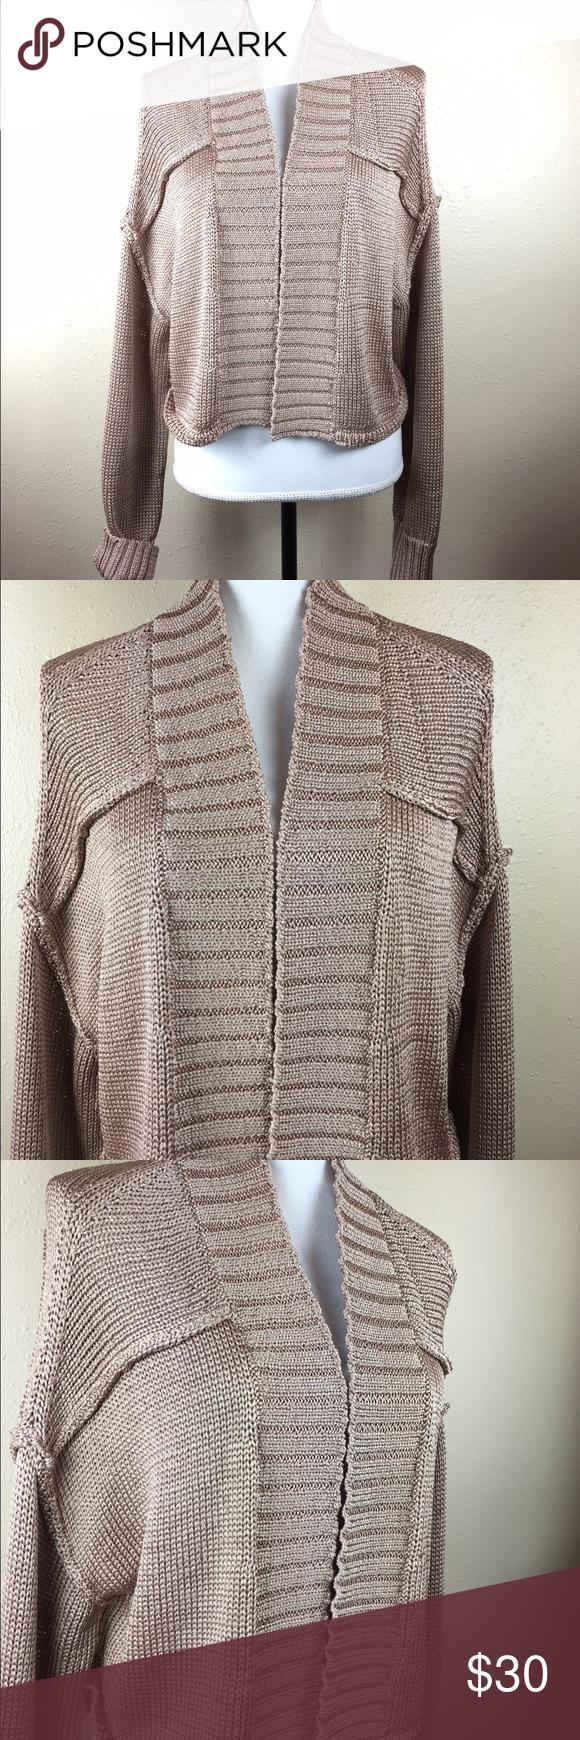 Elizabeth & James Tan Shrug Knit Sweater Size L Great sweater ...